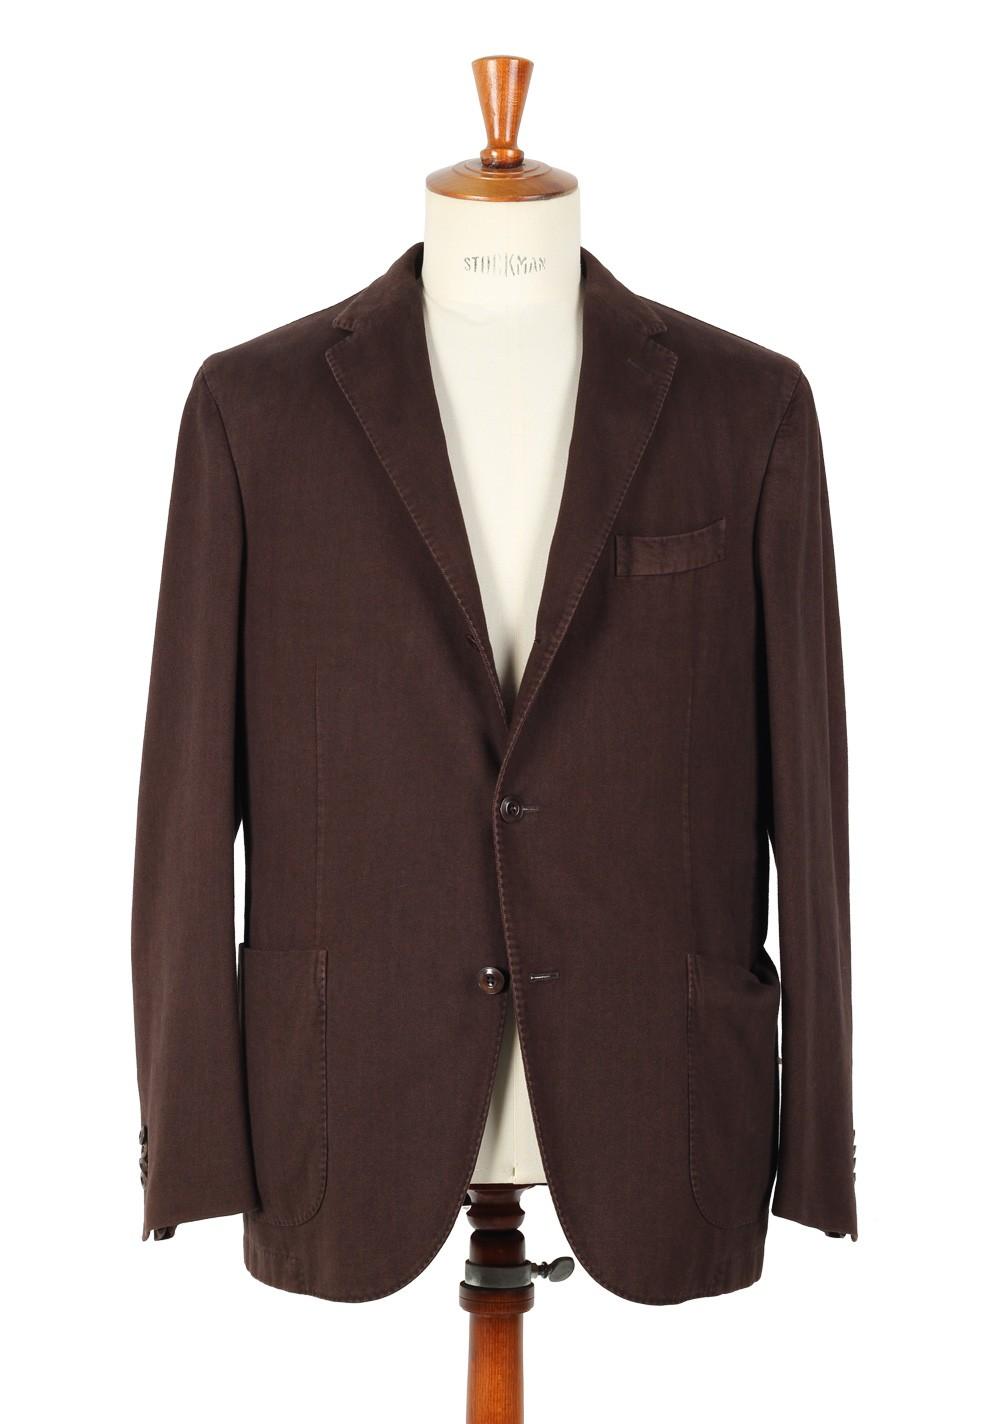 50  Boglioli sport coats in size 46 - 60 / 36R - 50R | Styleforum